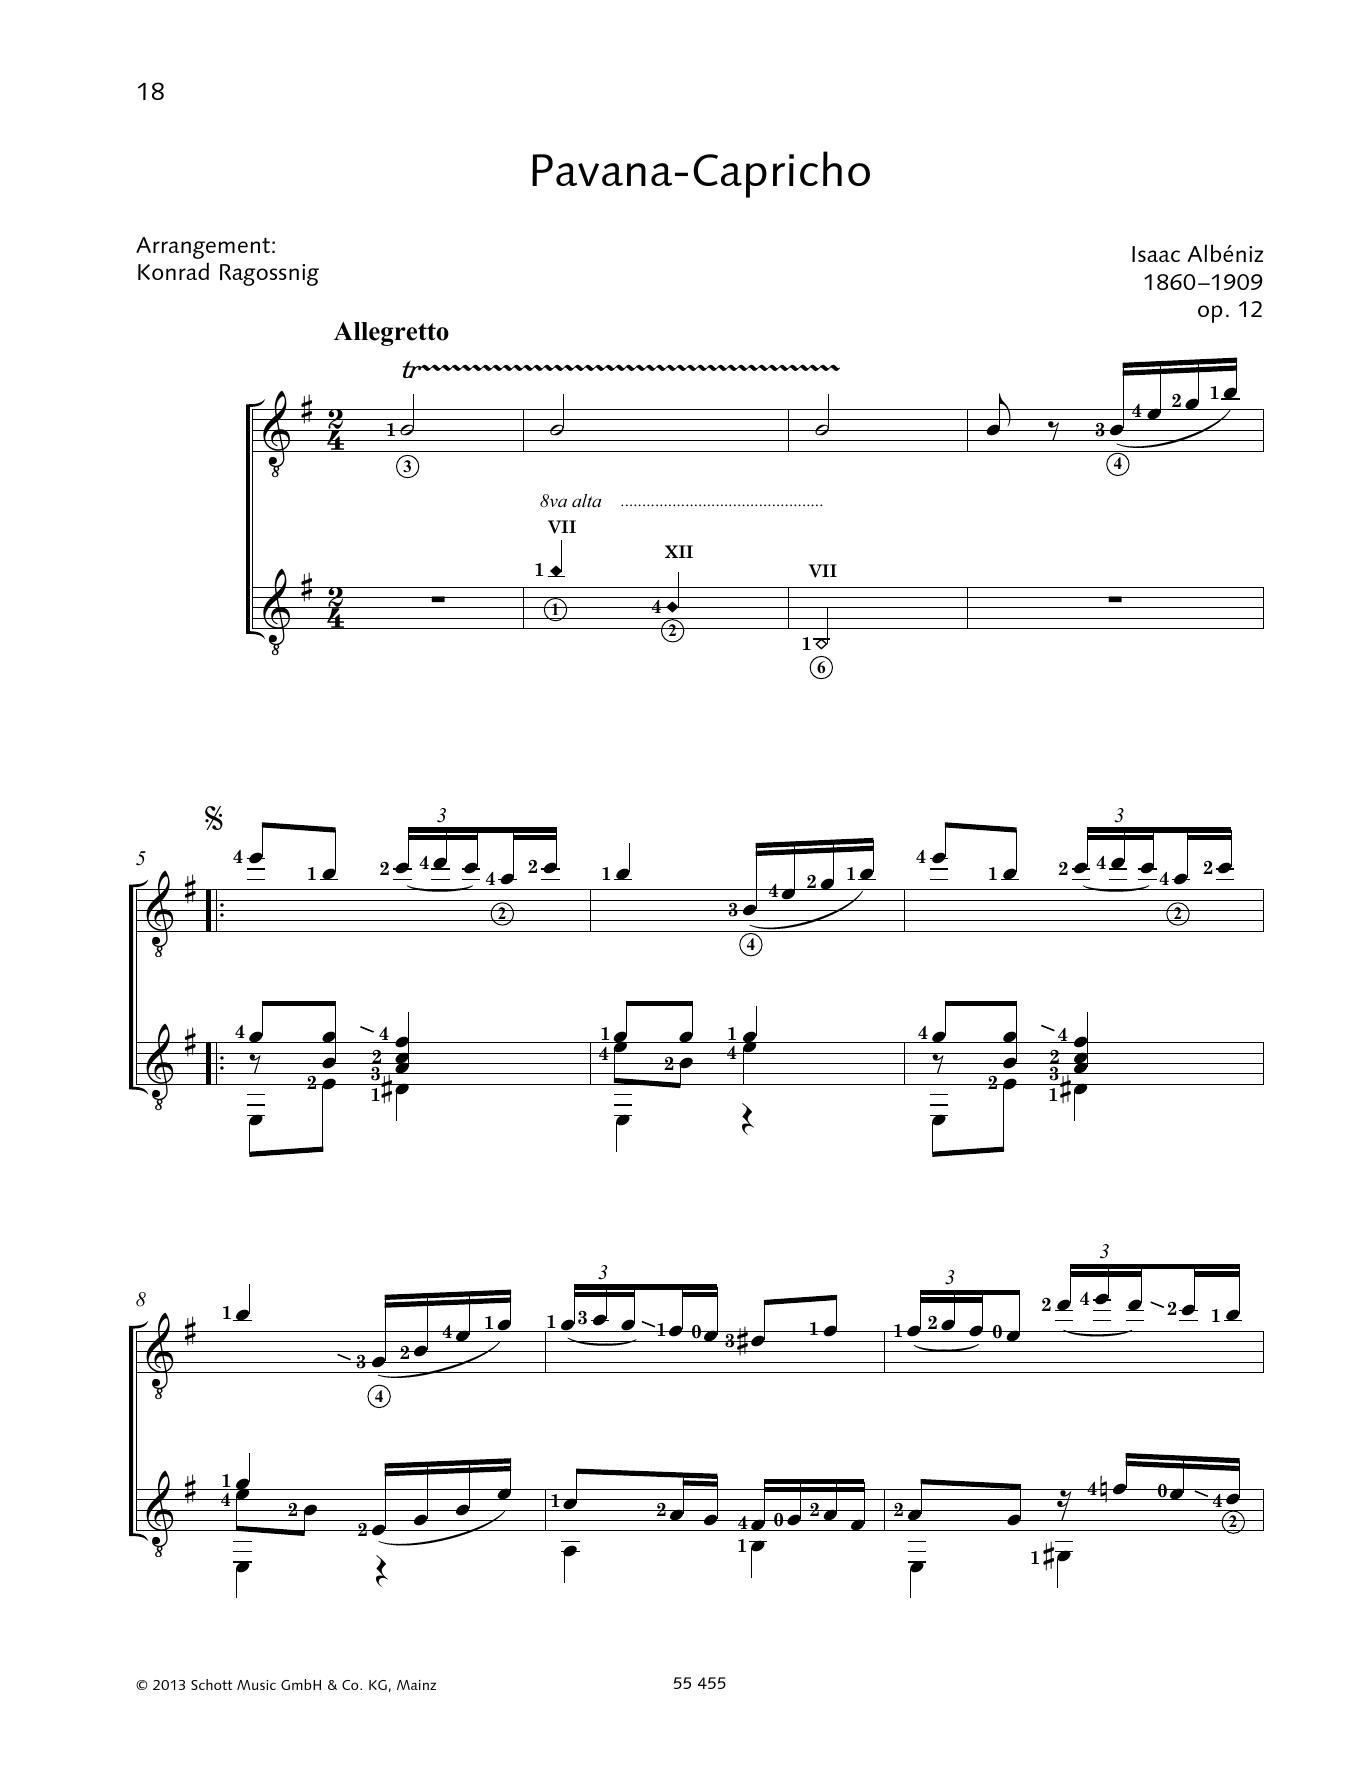 Pavana-Capricho - Full Score Sheet Music